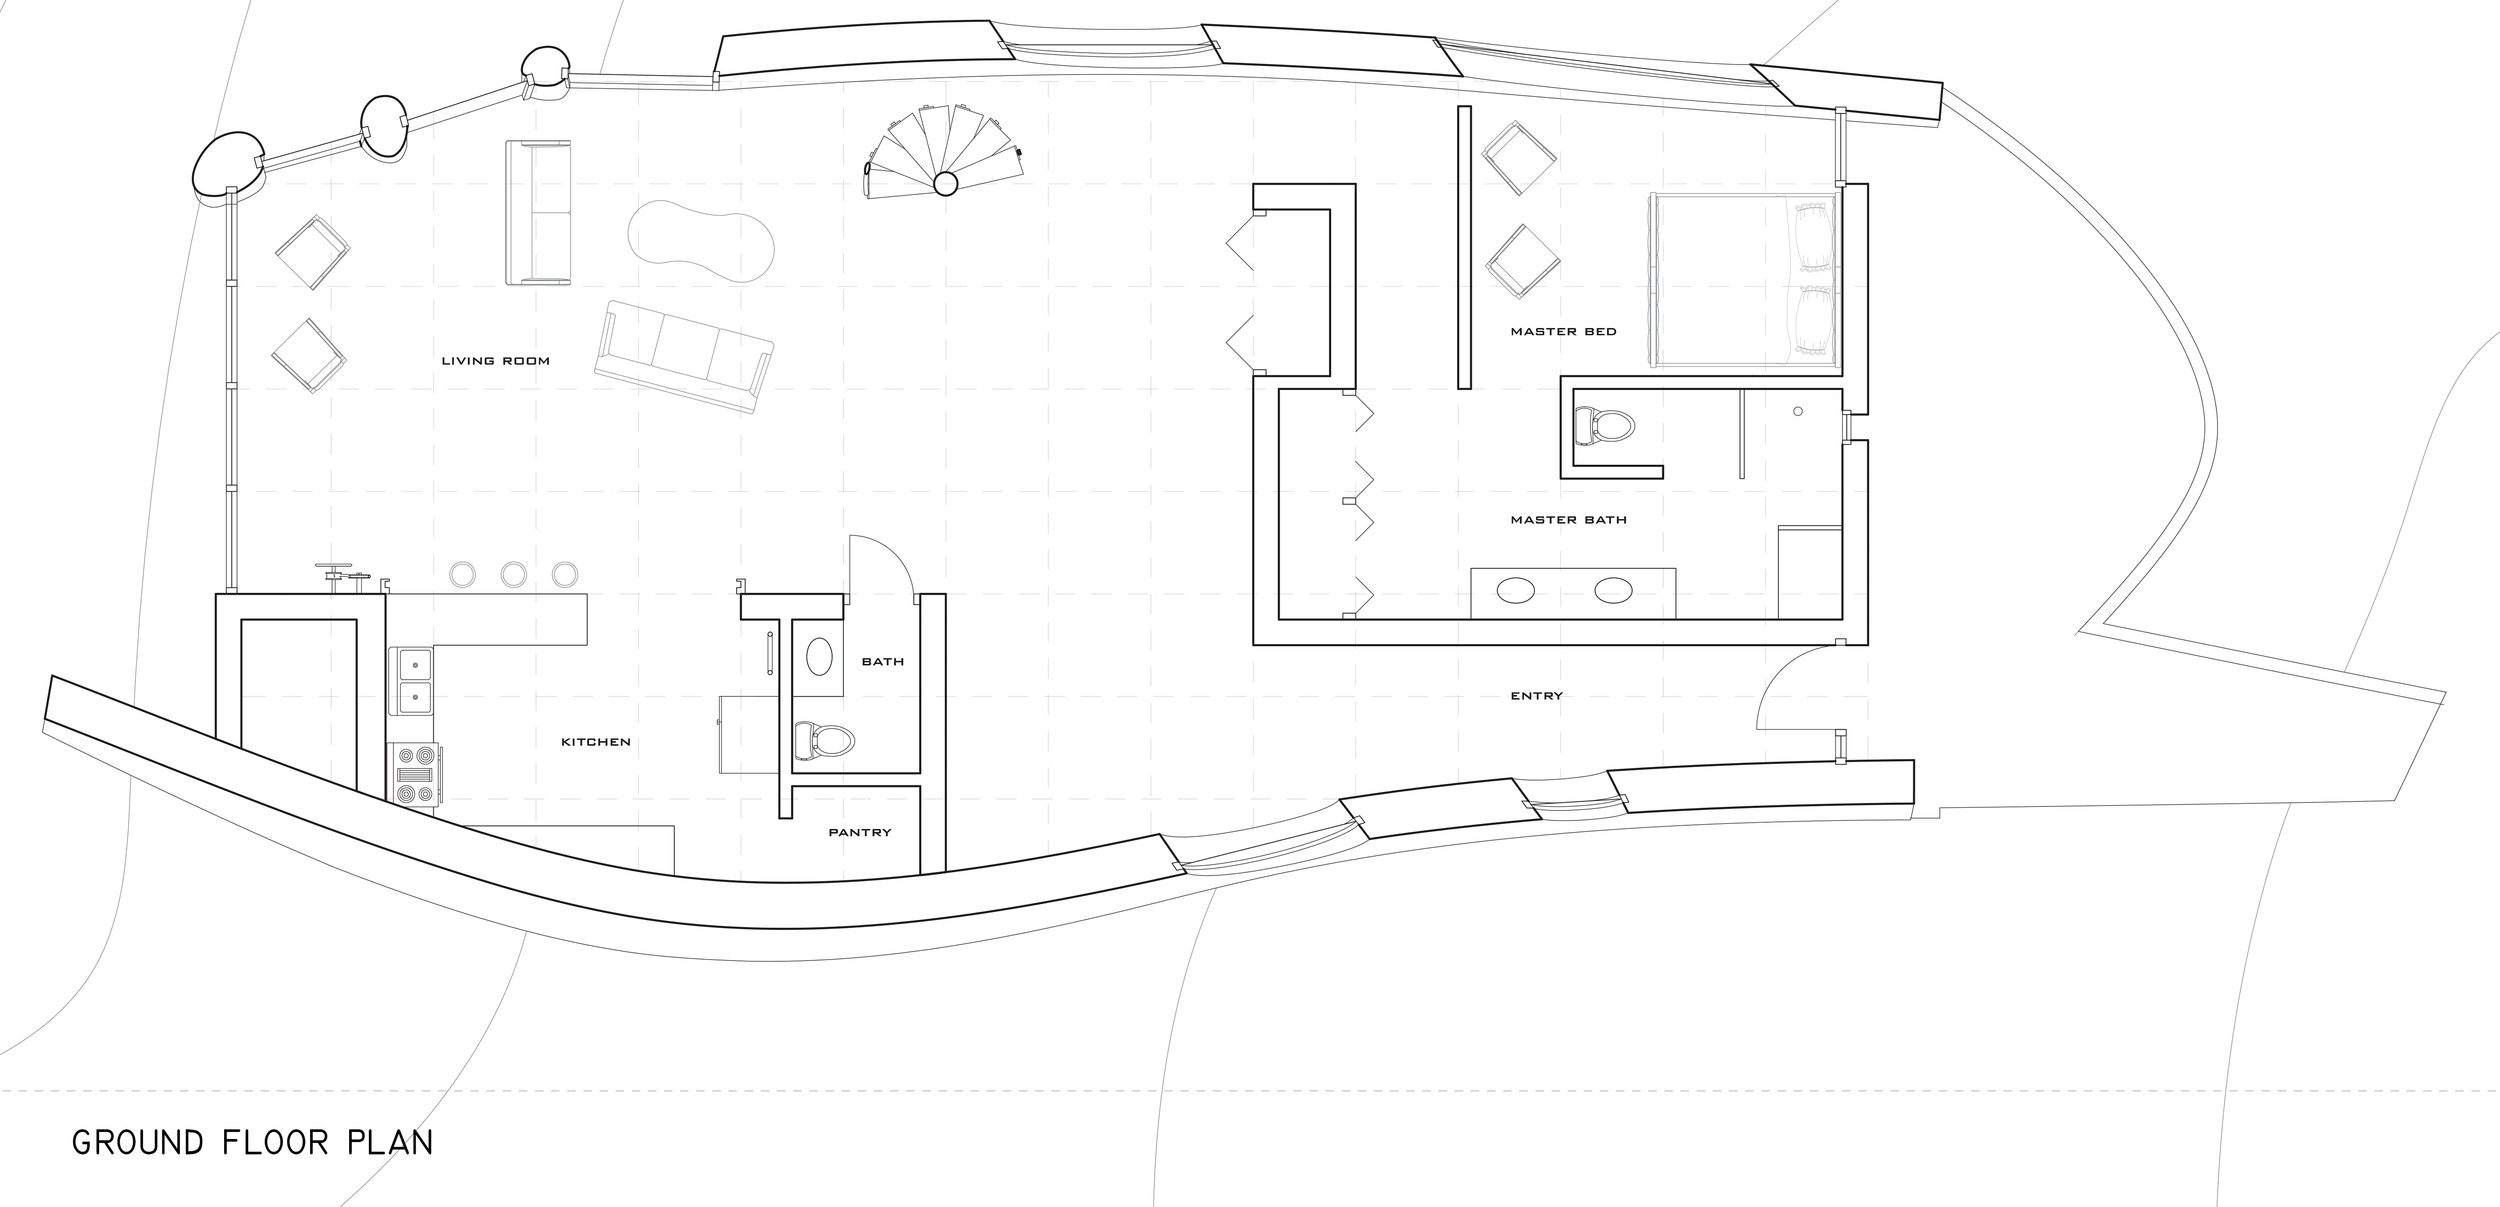 plan_2(really1)_layout.jpg